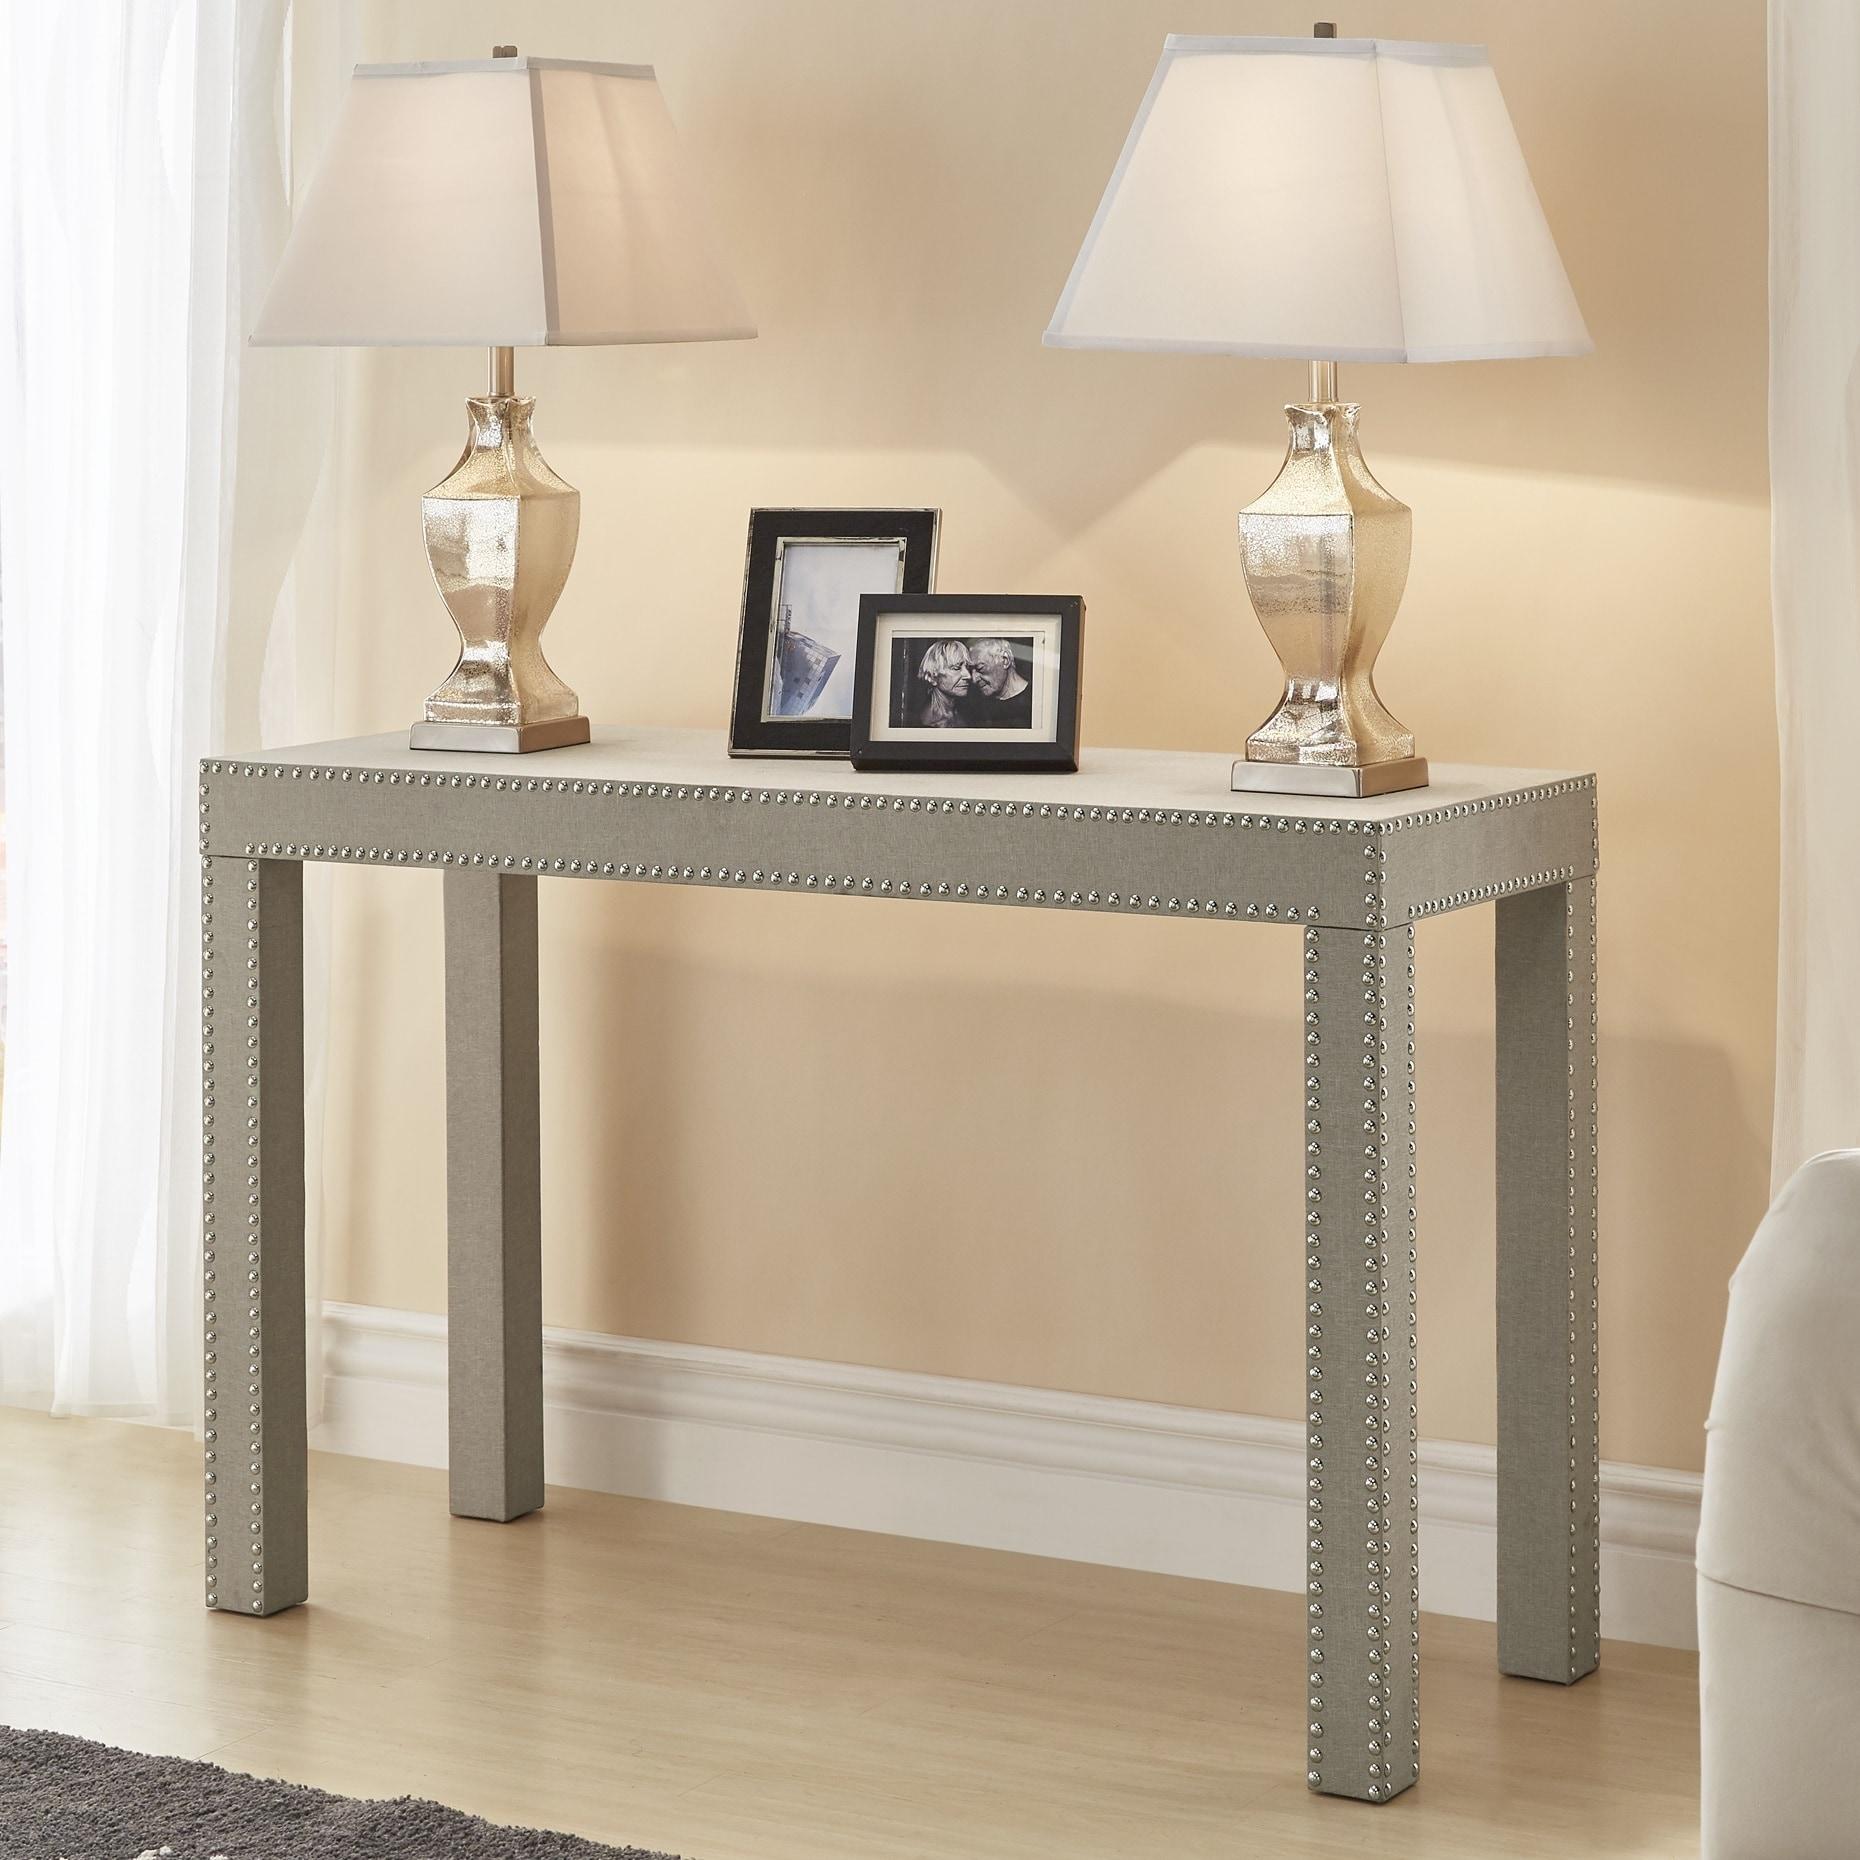 shop emery beige linen nailhead trim sofa table by inspire q bold on sale free shipping today overstockcom 19433872 - Nailhead Trim Sofa